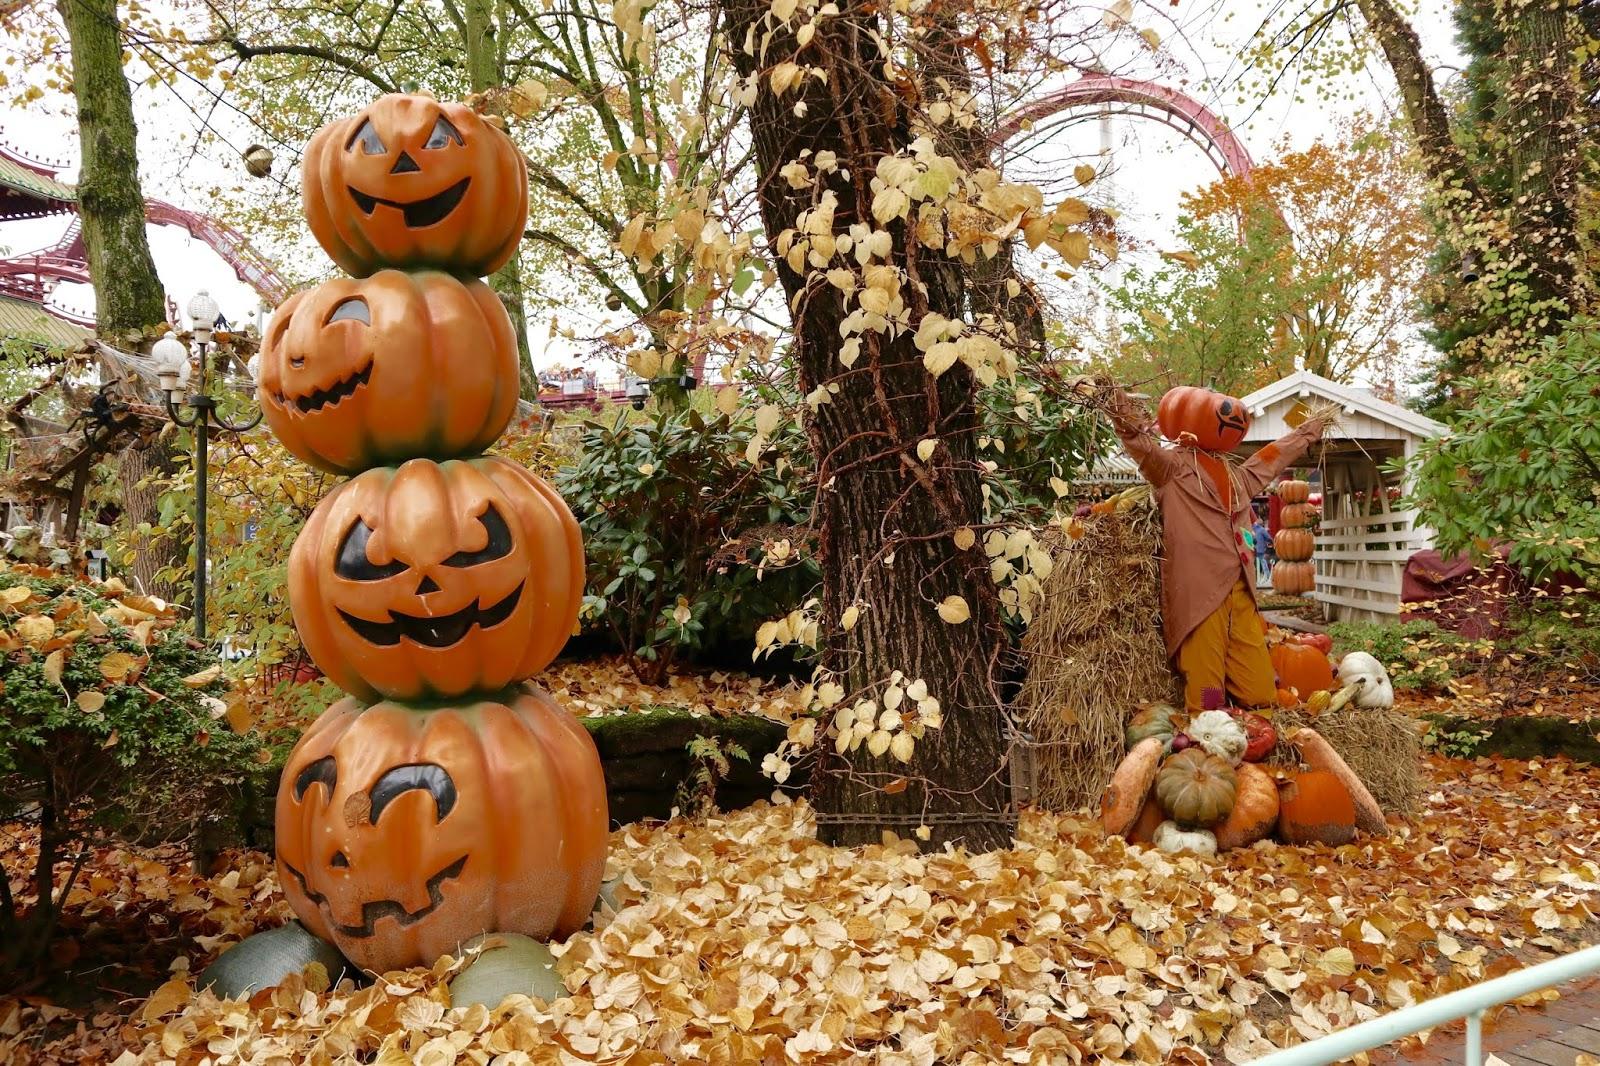 Halloween at Tivoli Gardens Copenhagen